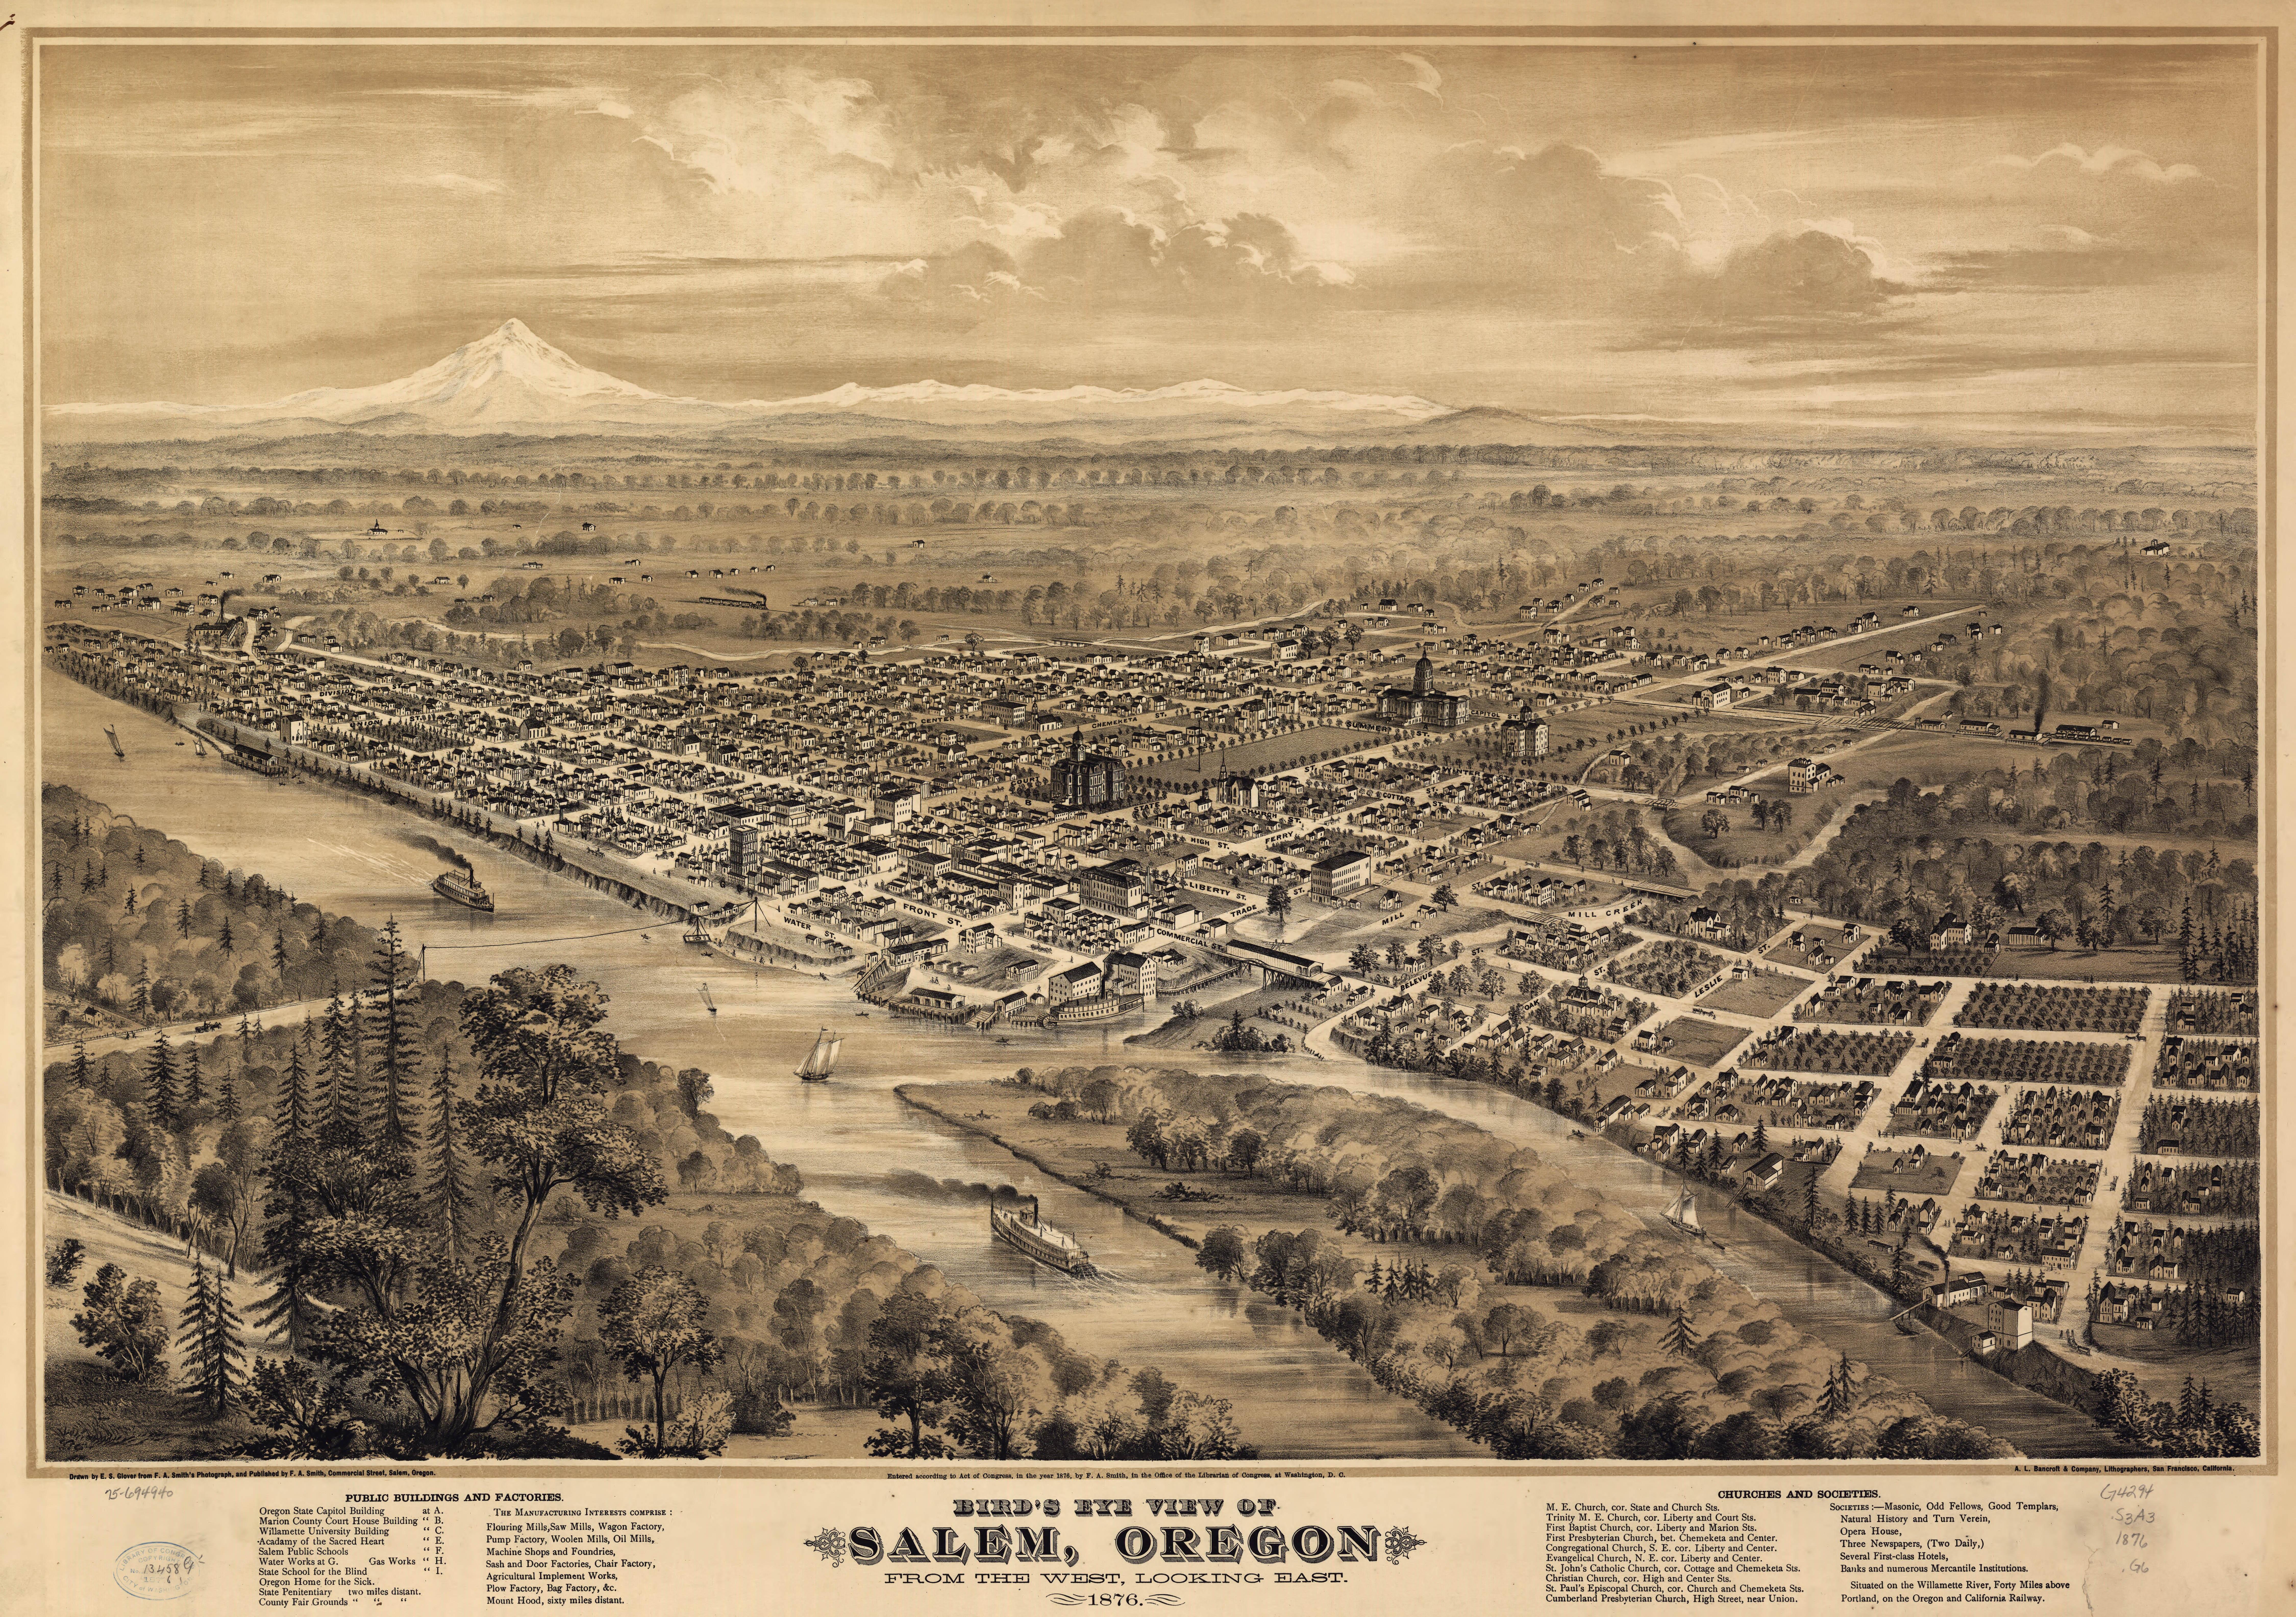 Glover\'s Birdseye Map of Salem, Oregon (1876)